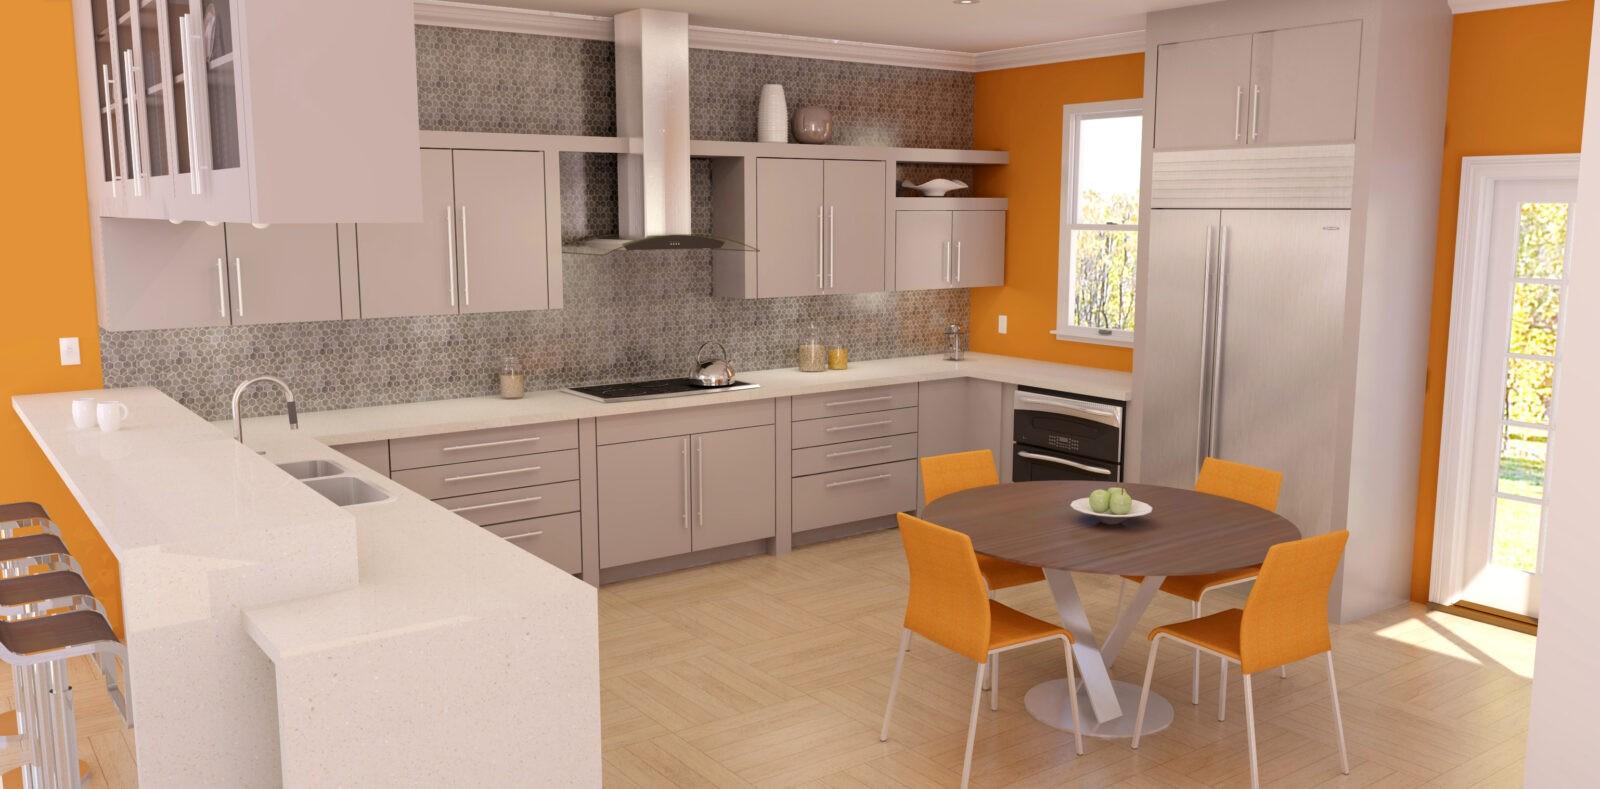 Top Kitchen Cabinet Design Trends for 2016 - Granite ...